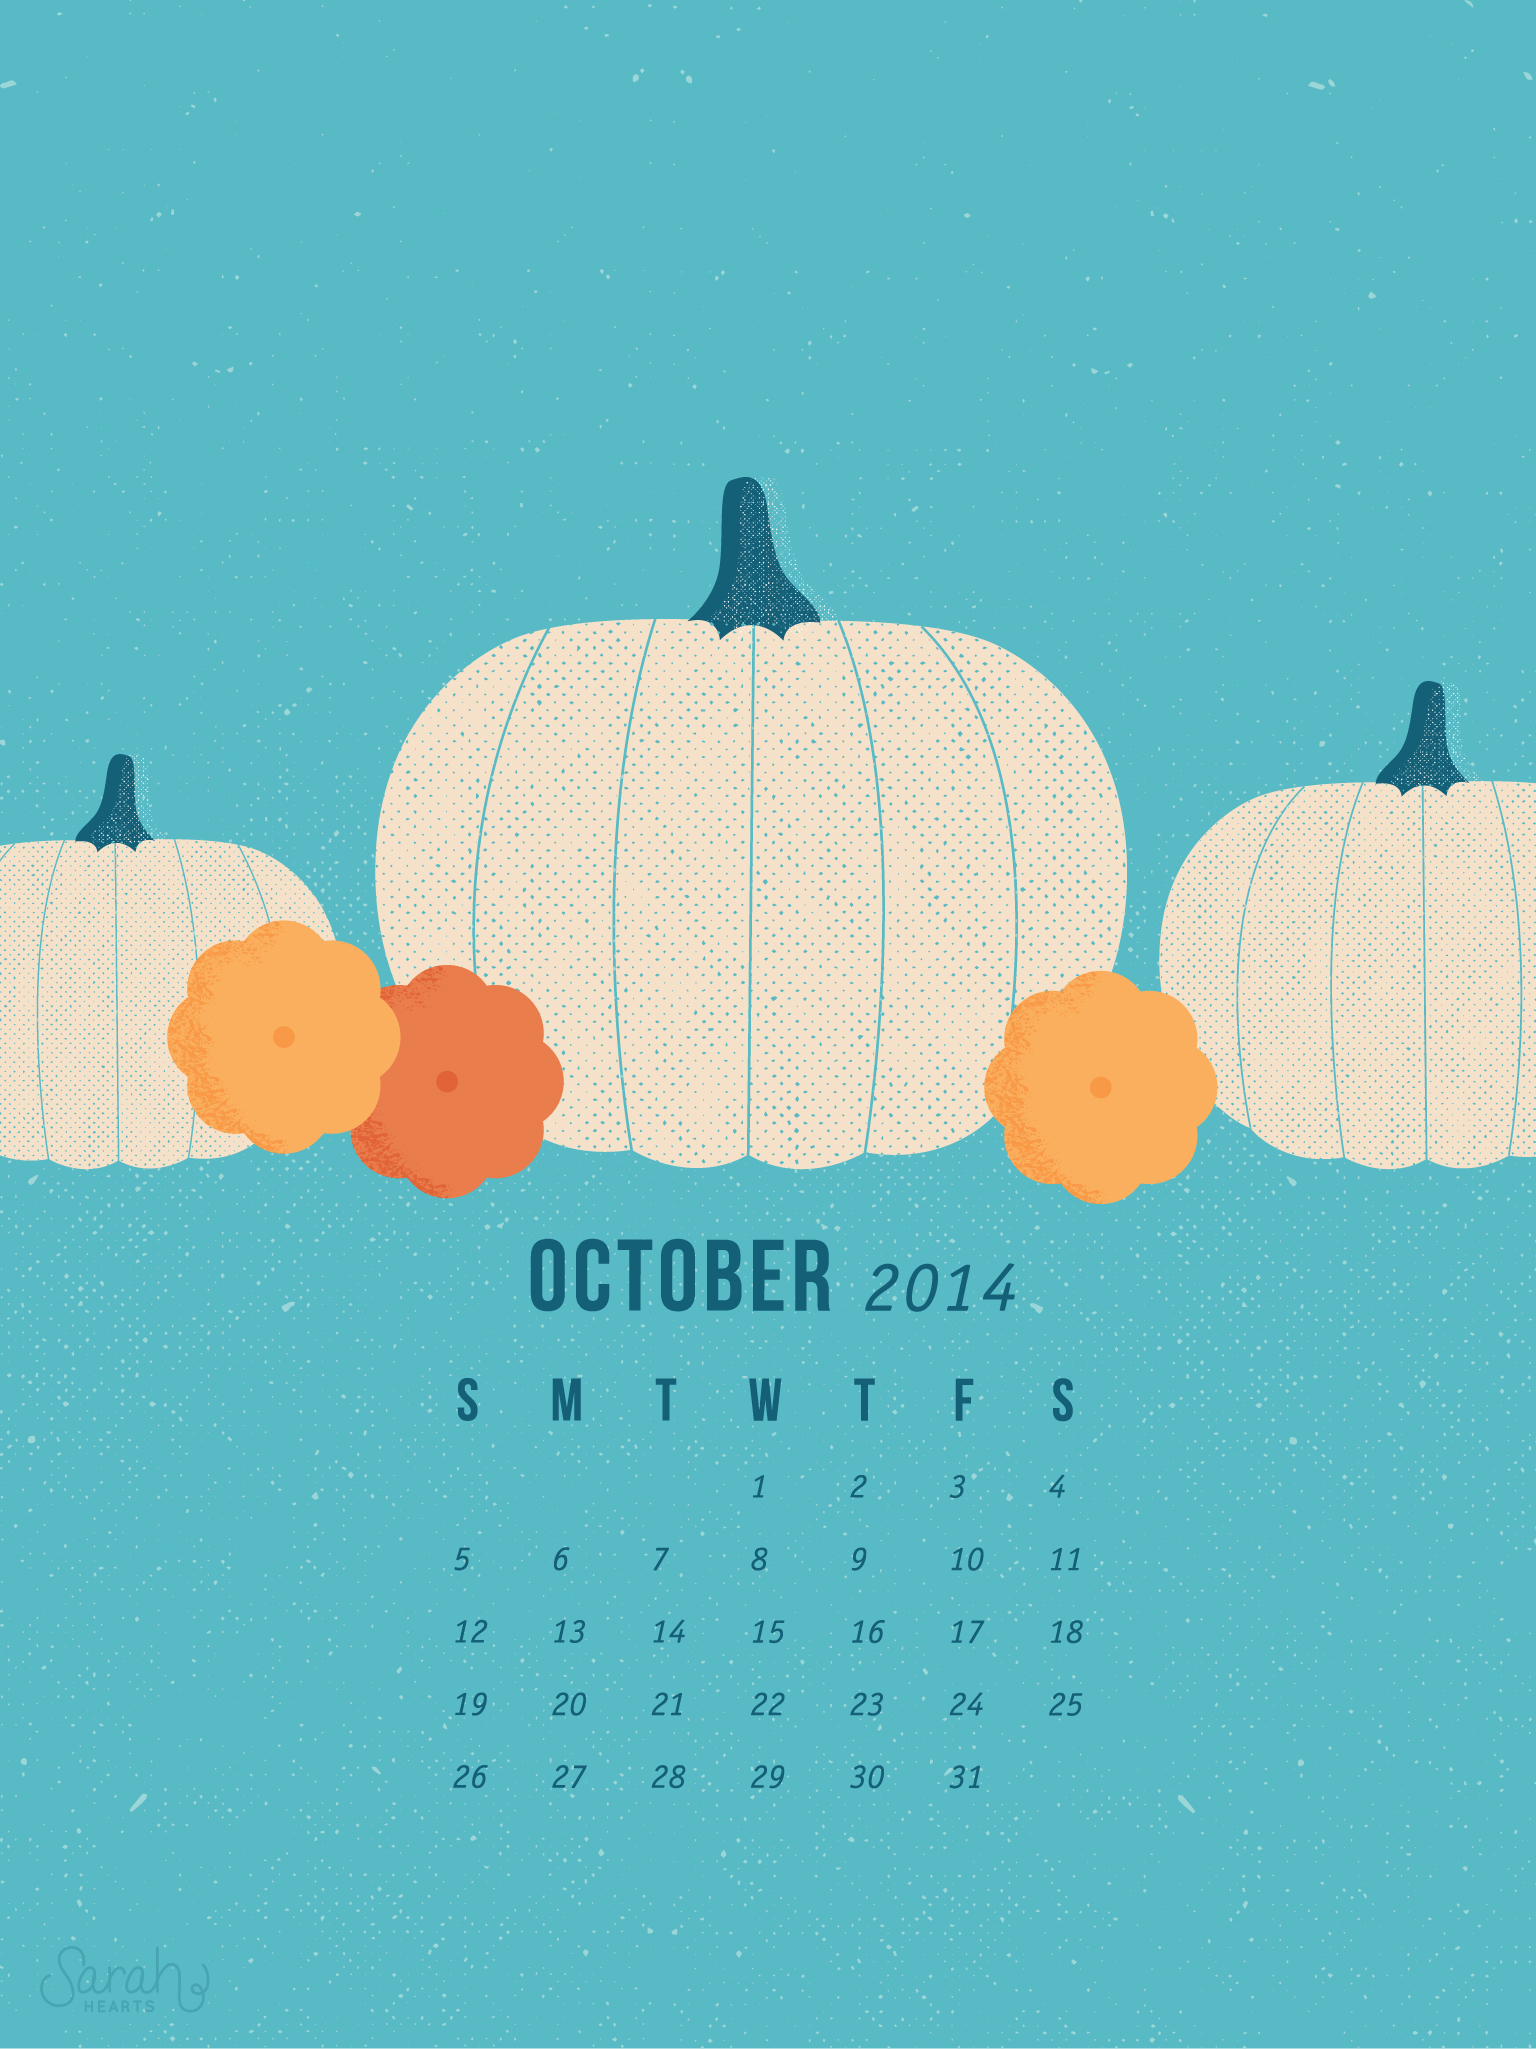 October Calendar Wallpaper Iphone : October calendar wallpapers sarah hearts